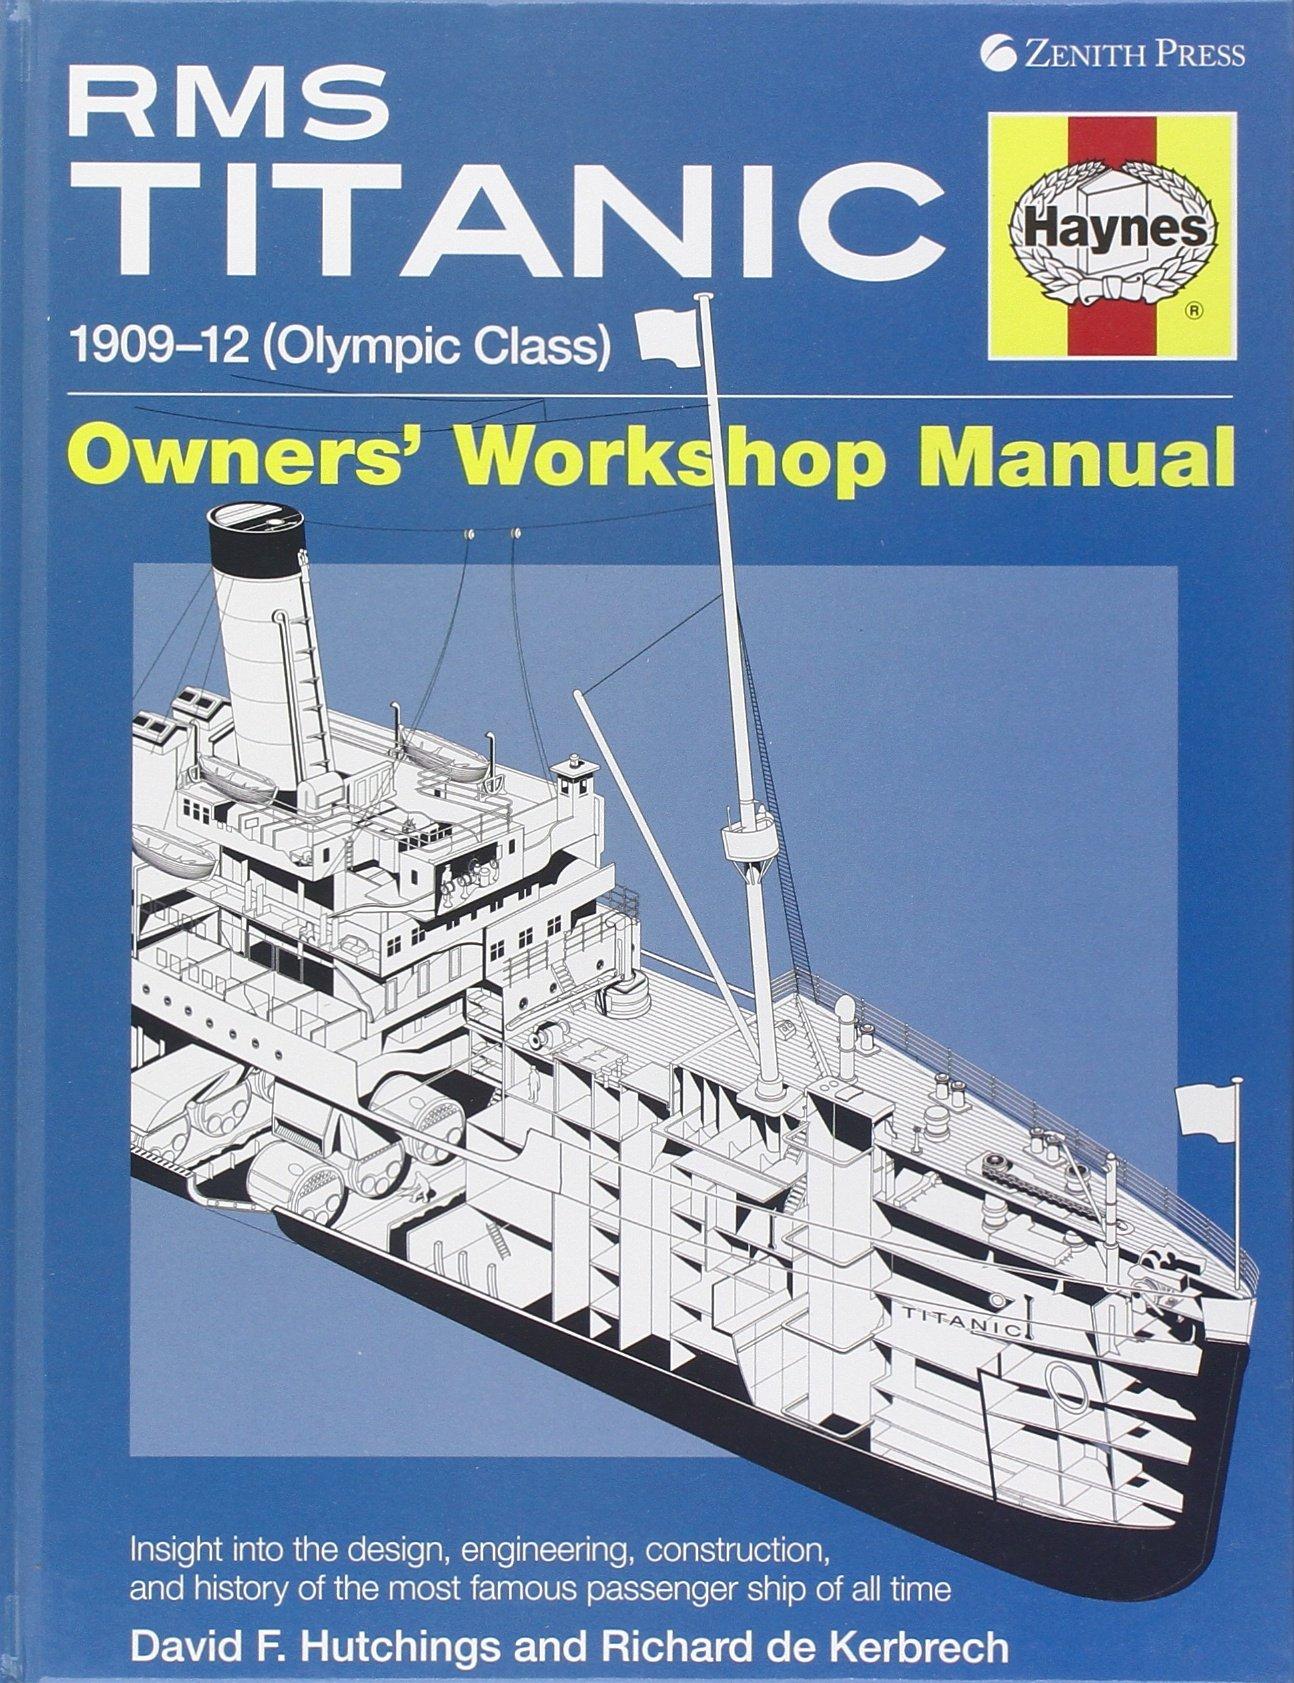 RMS Titanic Manual: 1909-1912 Olympic Class (Haynes Owners Workshop Manuals  (Hardcover)): David Hutchings, Richard de Kerbrech: 9780760340790:  Amazon.com: ...